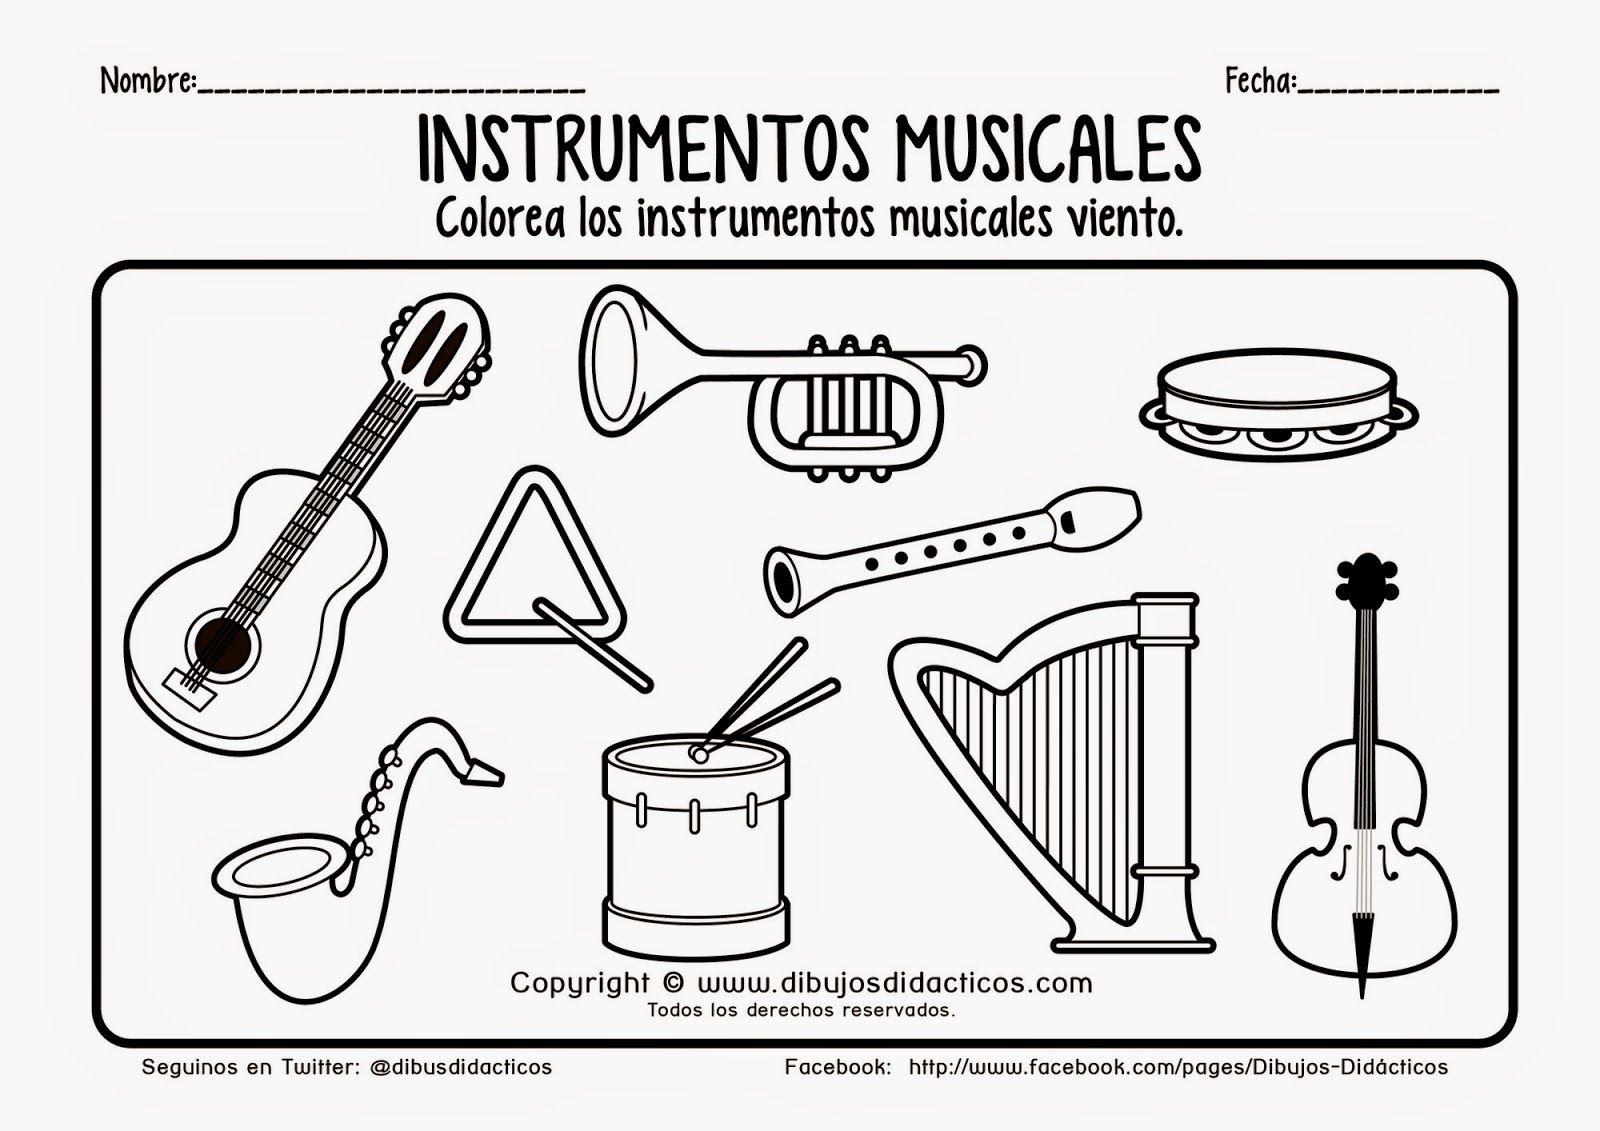 Lamina De Instrumentos Musicales Para Imprimir Y Colorear 2 2013082 Imagenes De Instrumentos Musicales Instrumentos Musicales Dibujos De Instrumentos Musicales